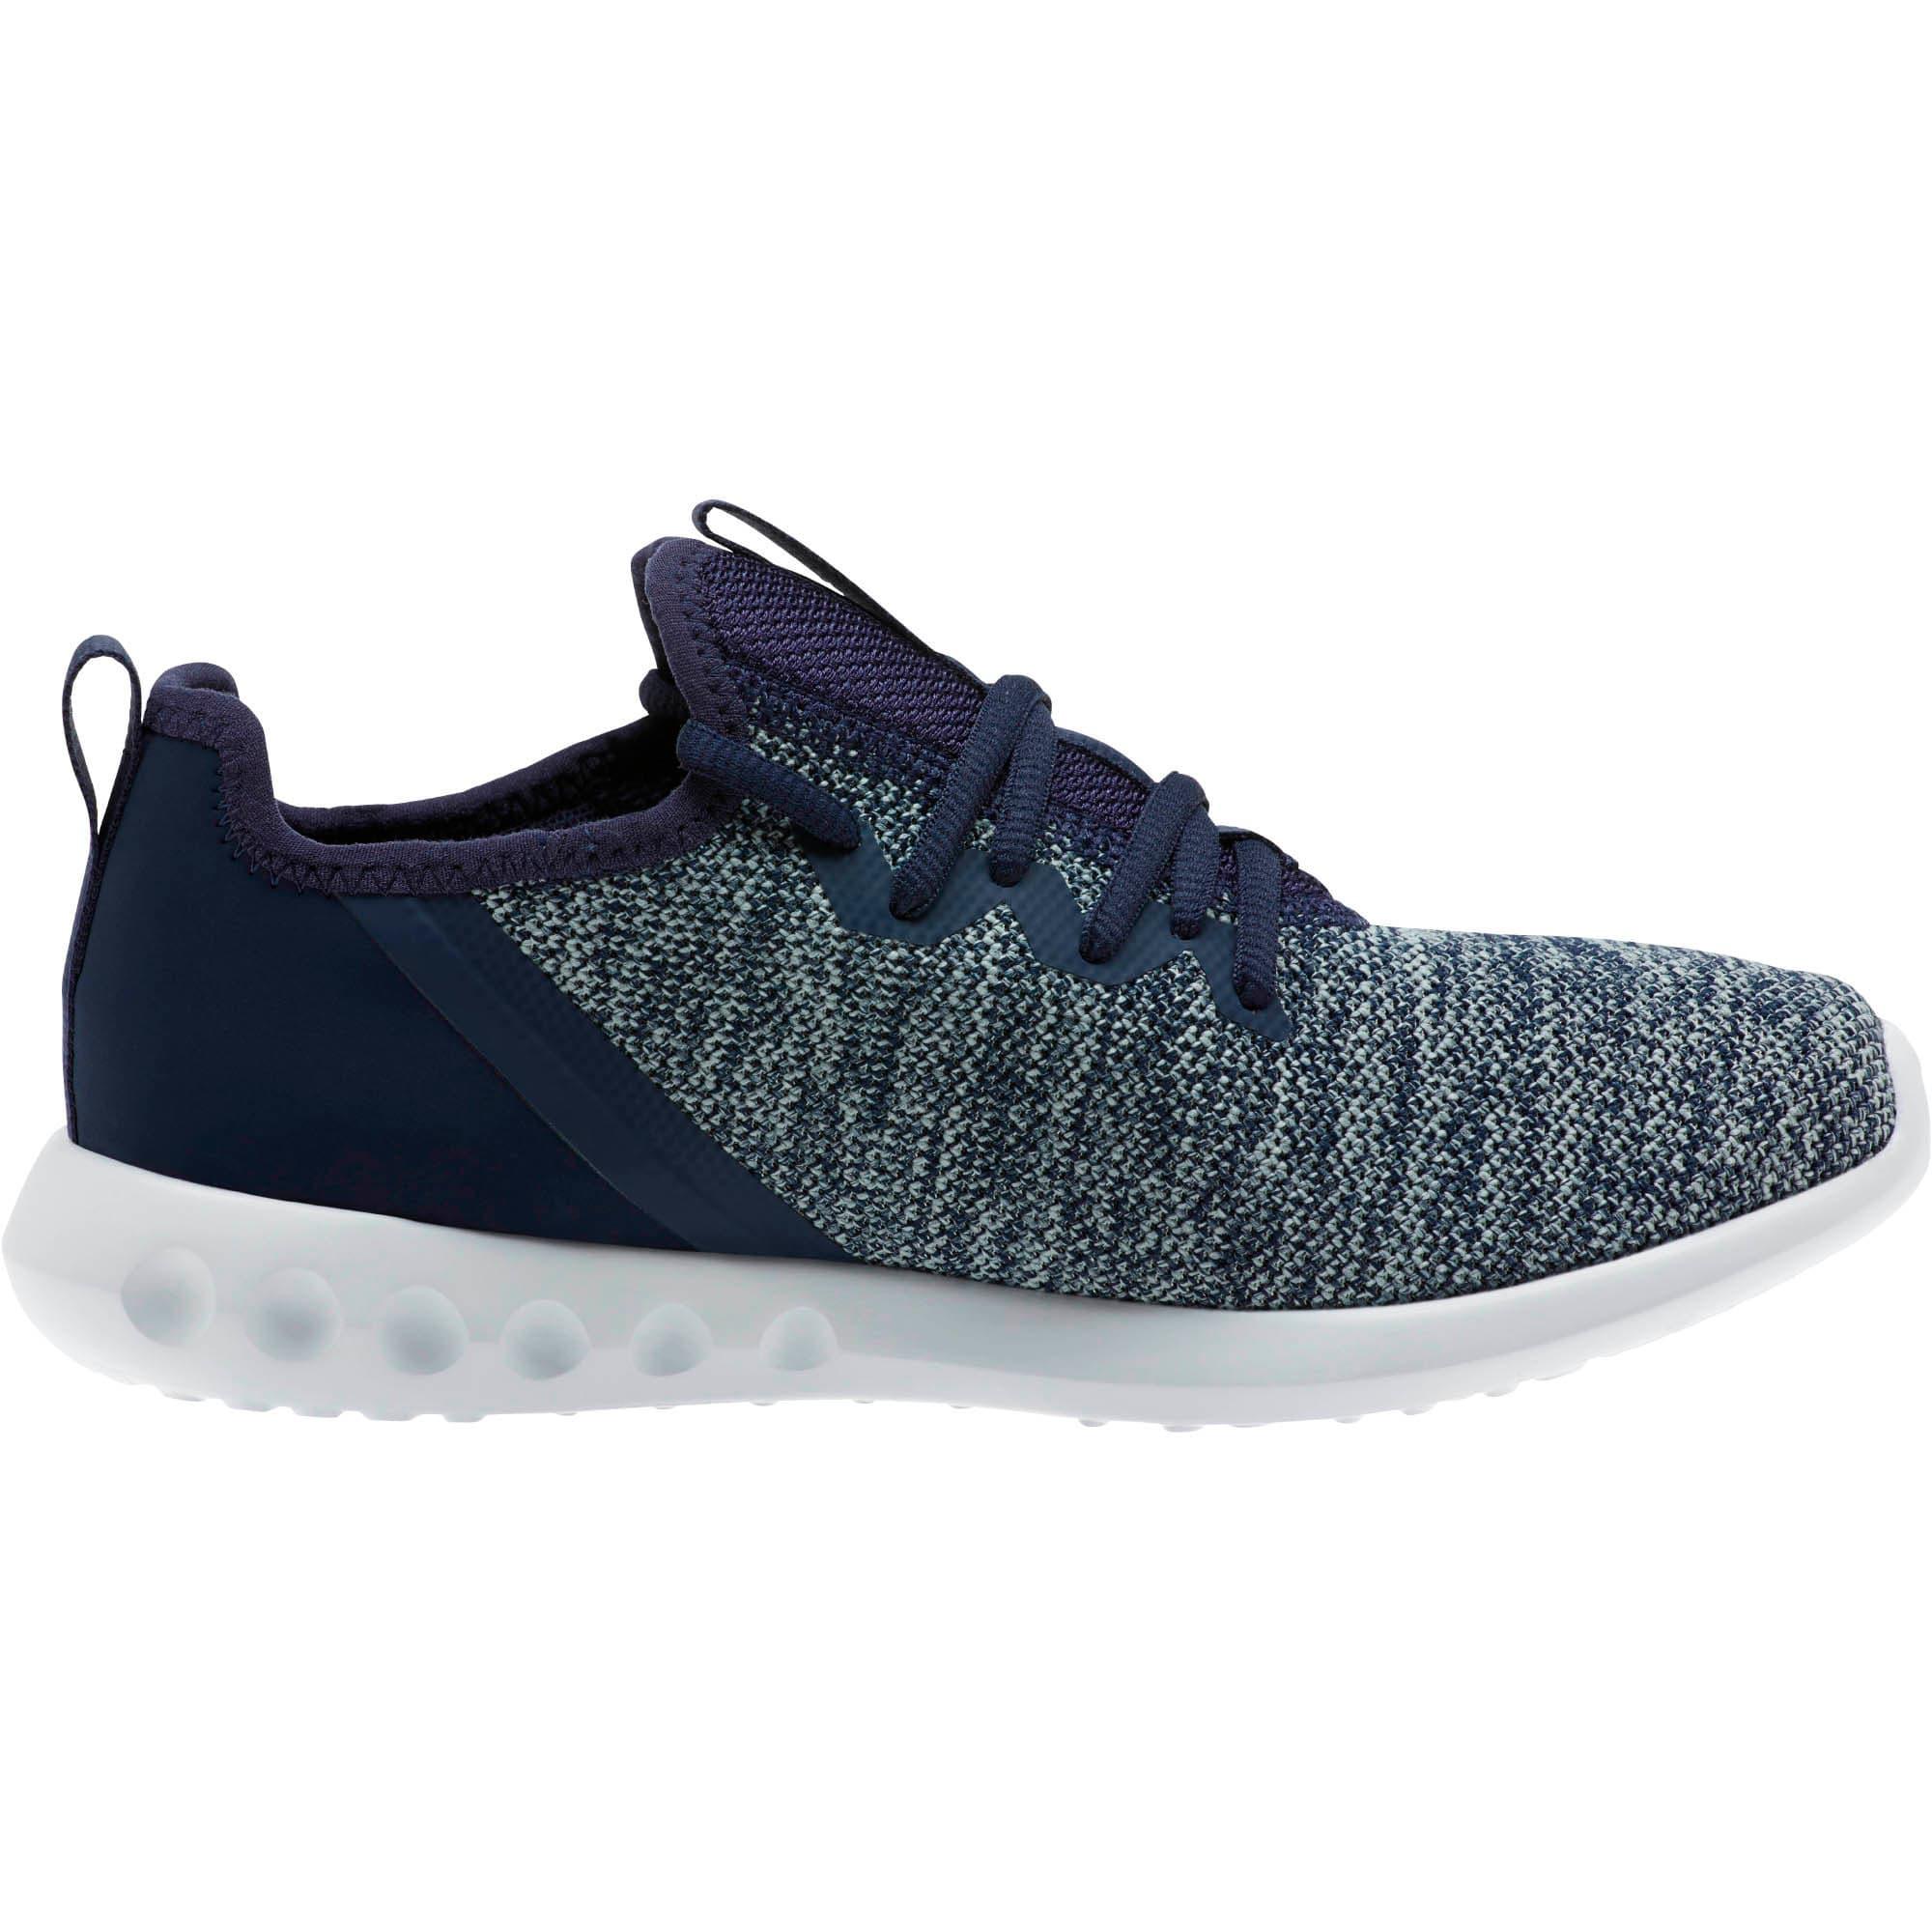 Thumbnail 4 of Carson 2 X Knit Women's Running Shoes, Peacoat-Quarry, medium